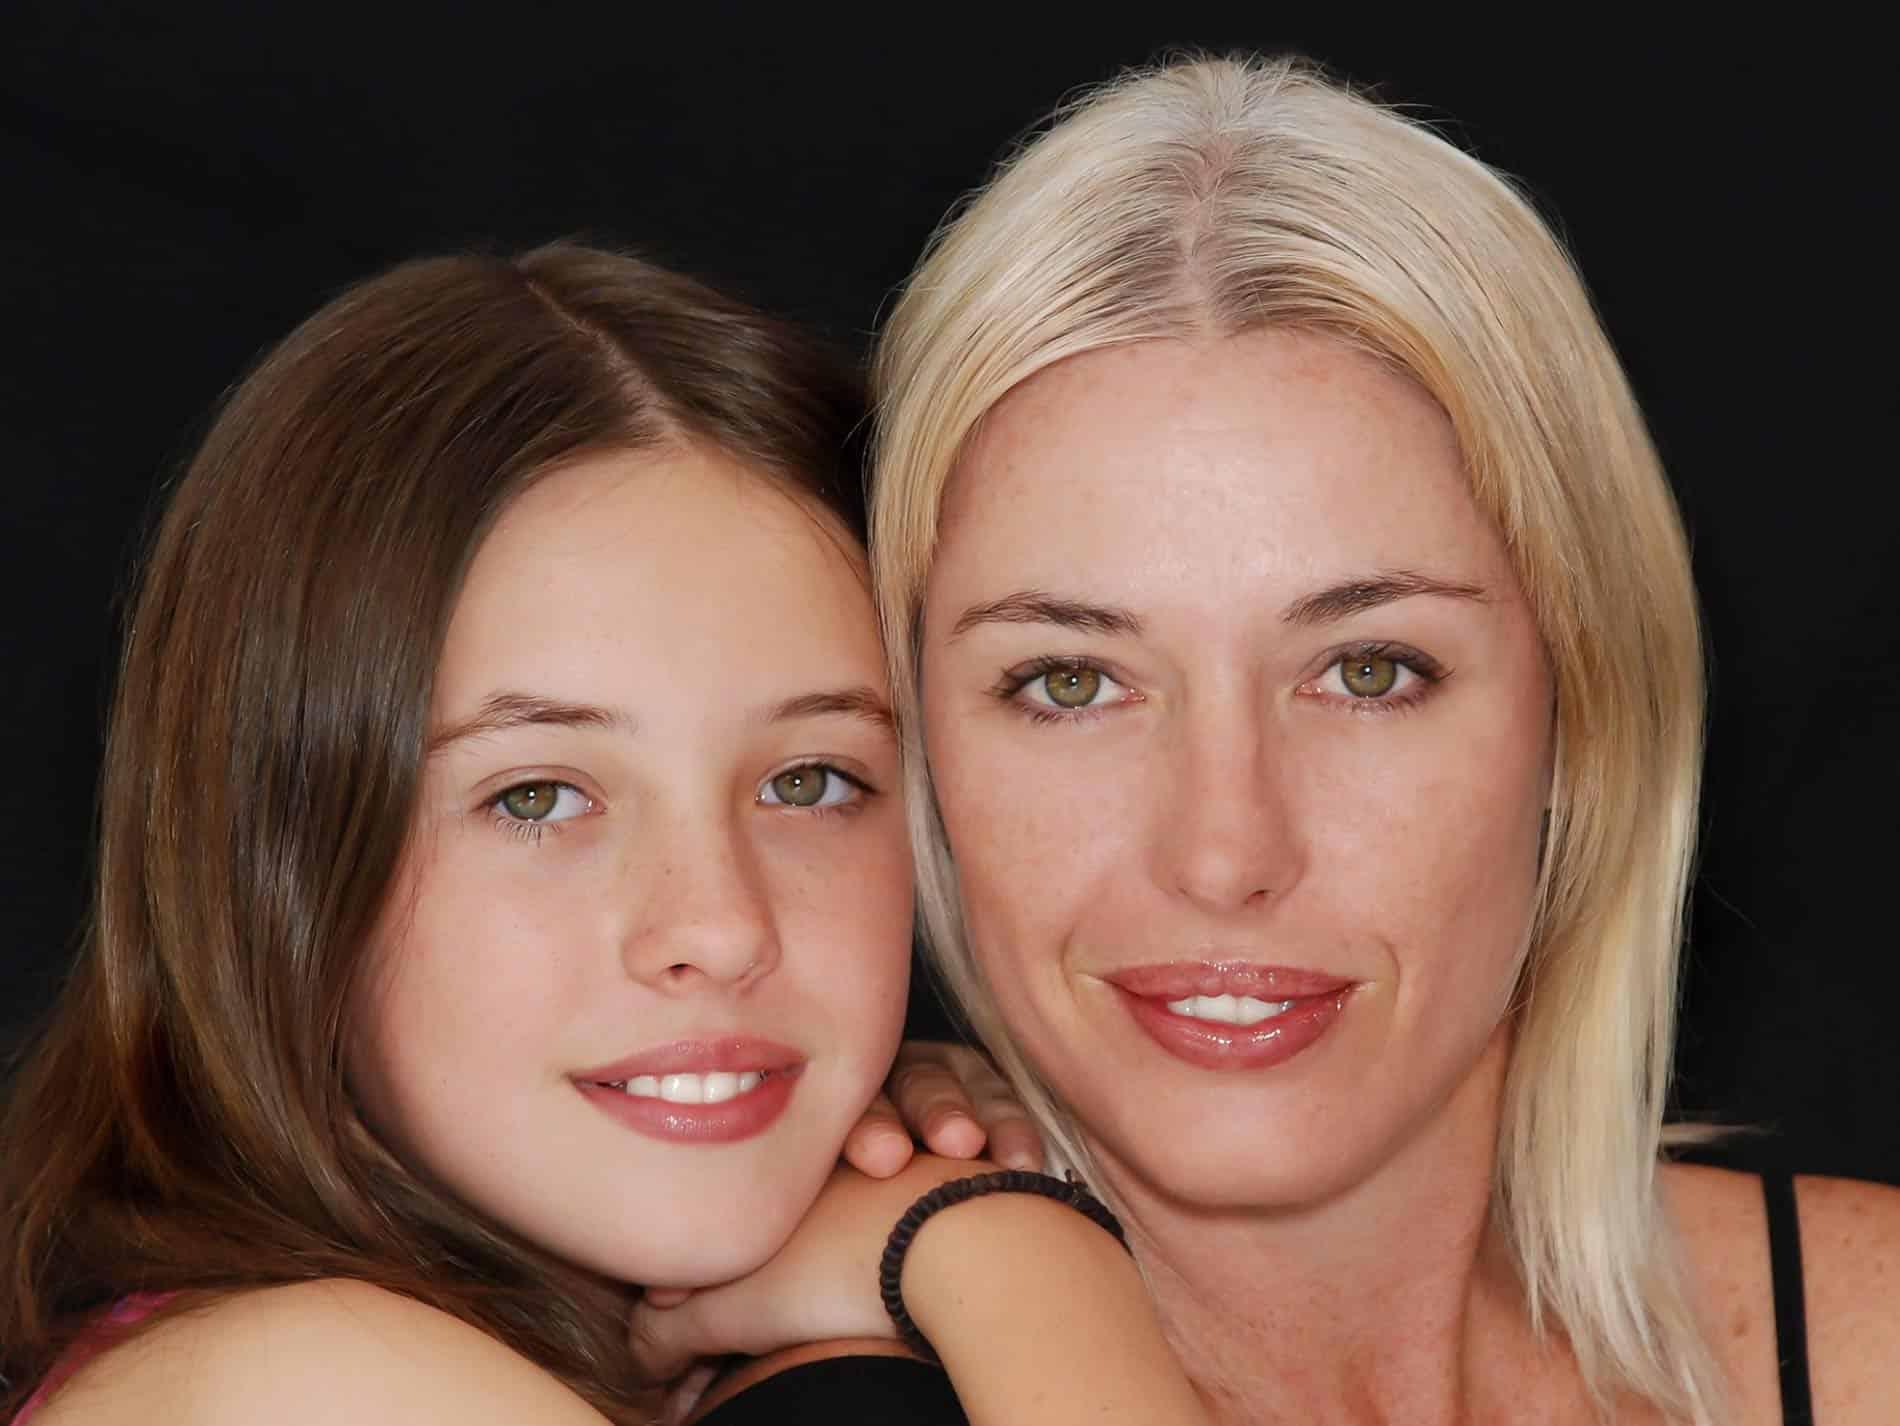 mother-daughter-date-ideas